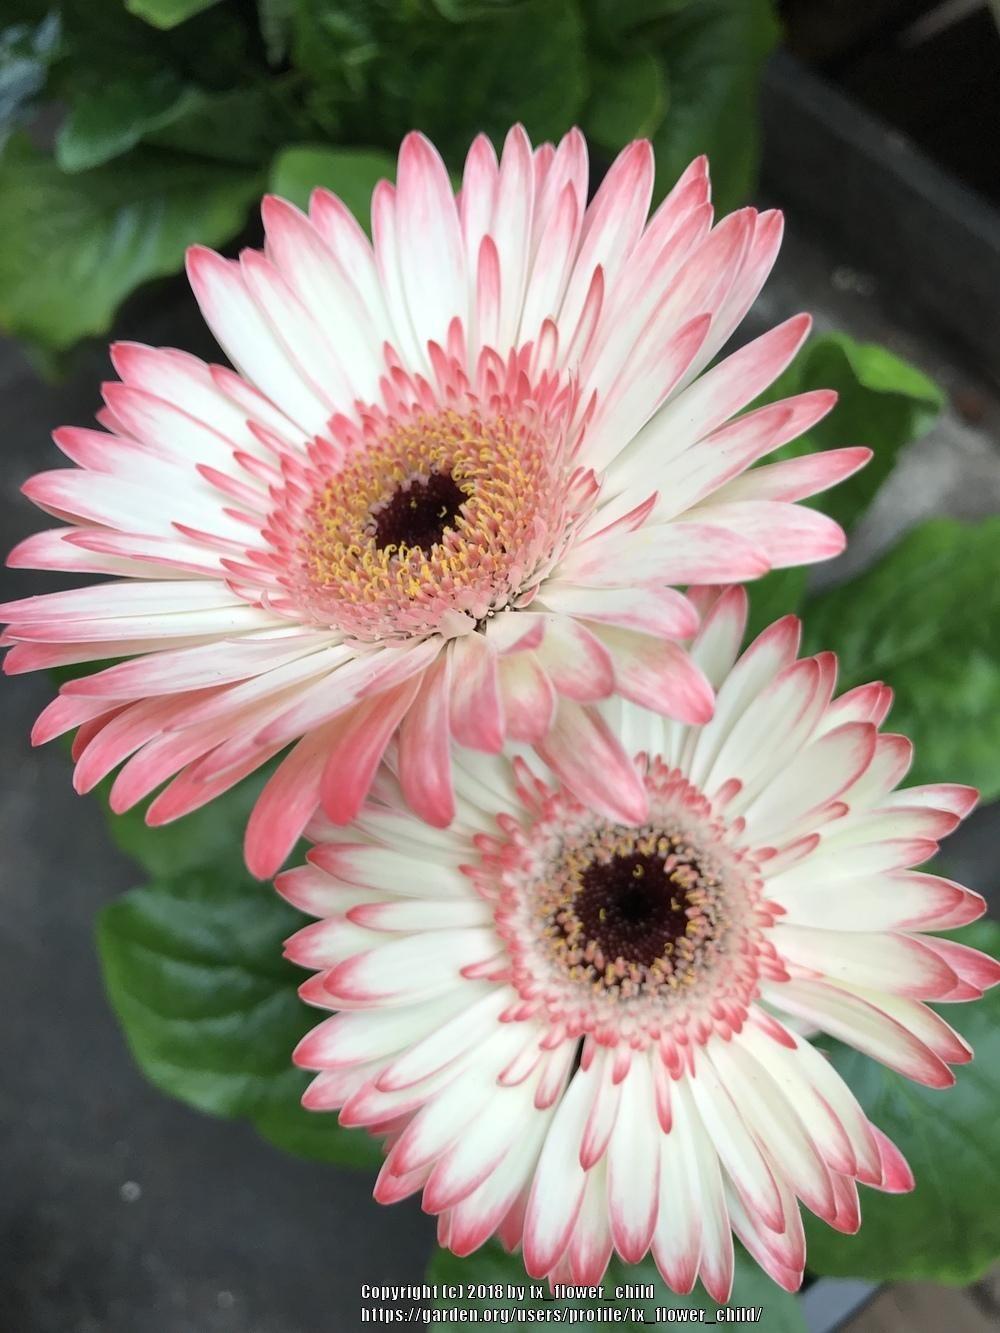 Gerberas Sun Rays On Stems Flower Seeds Gerbera Flower Gerbera Daisy Care